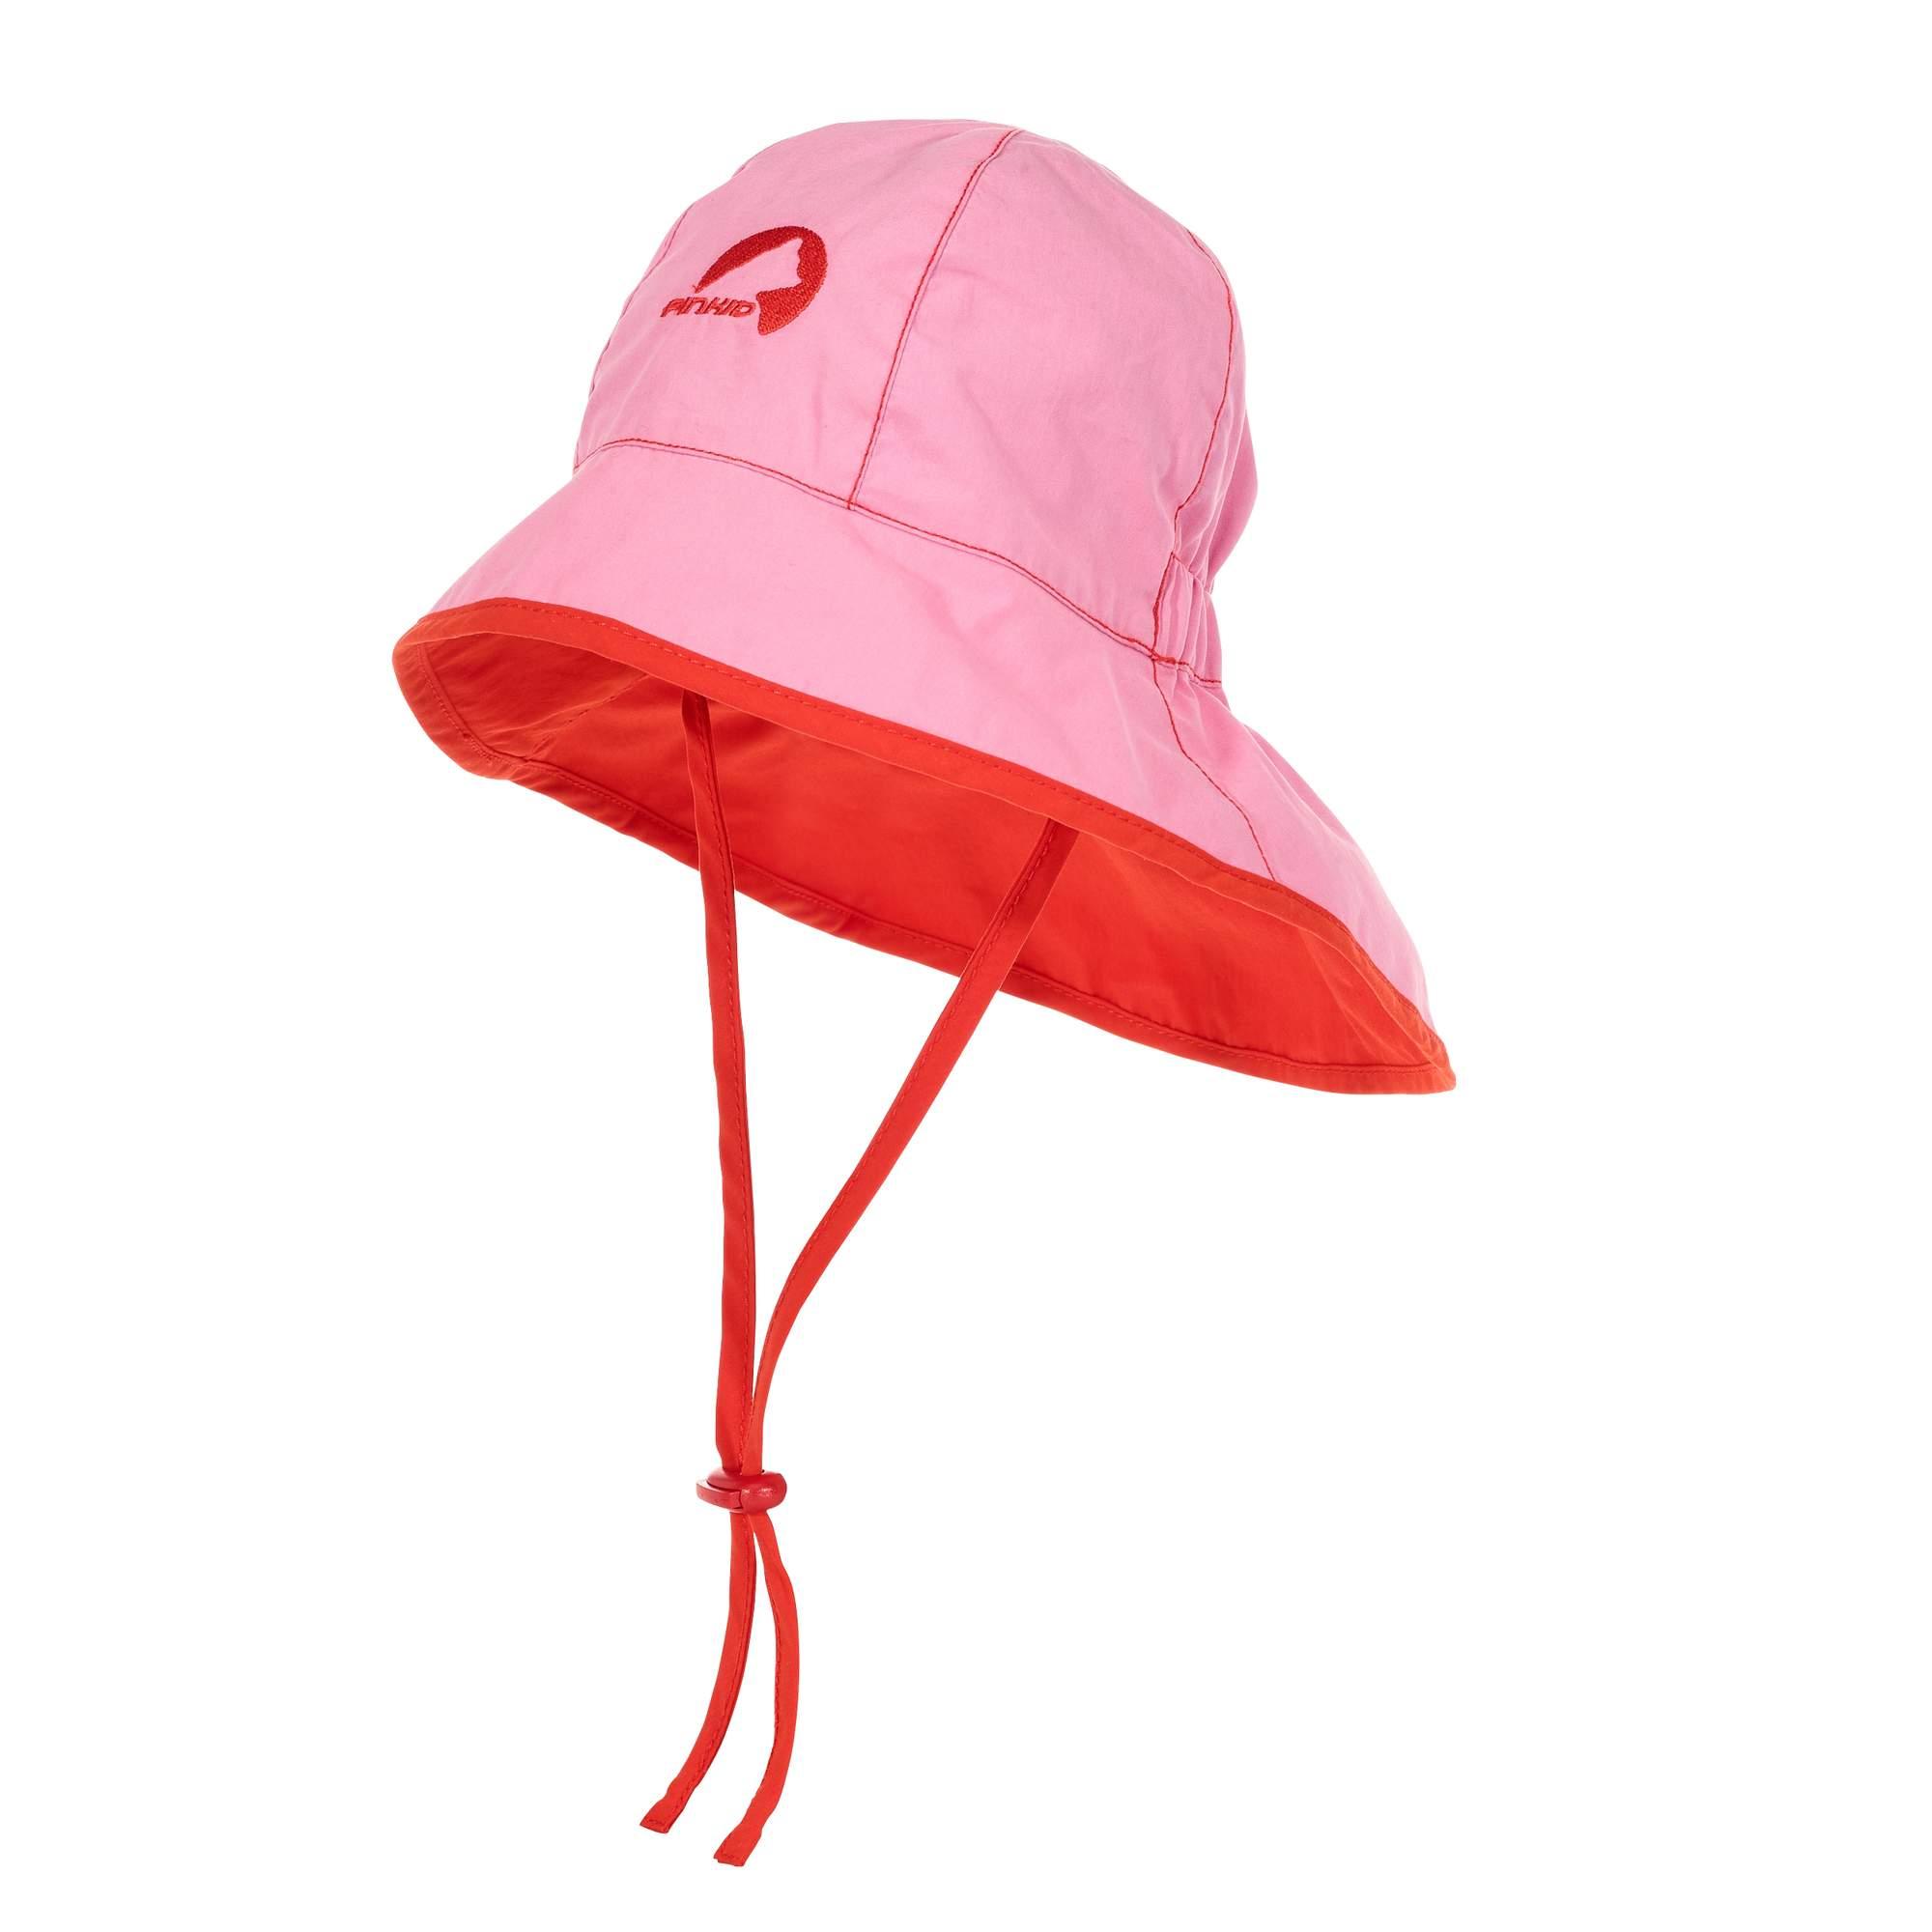 Finkid Ranta Sport Kinder Gr. 52 cm - pink-rosa / stardust/grenadine - Hüte 6031099